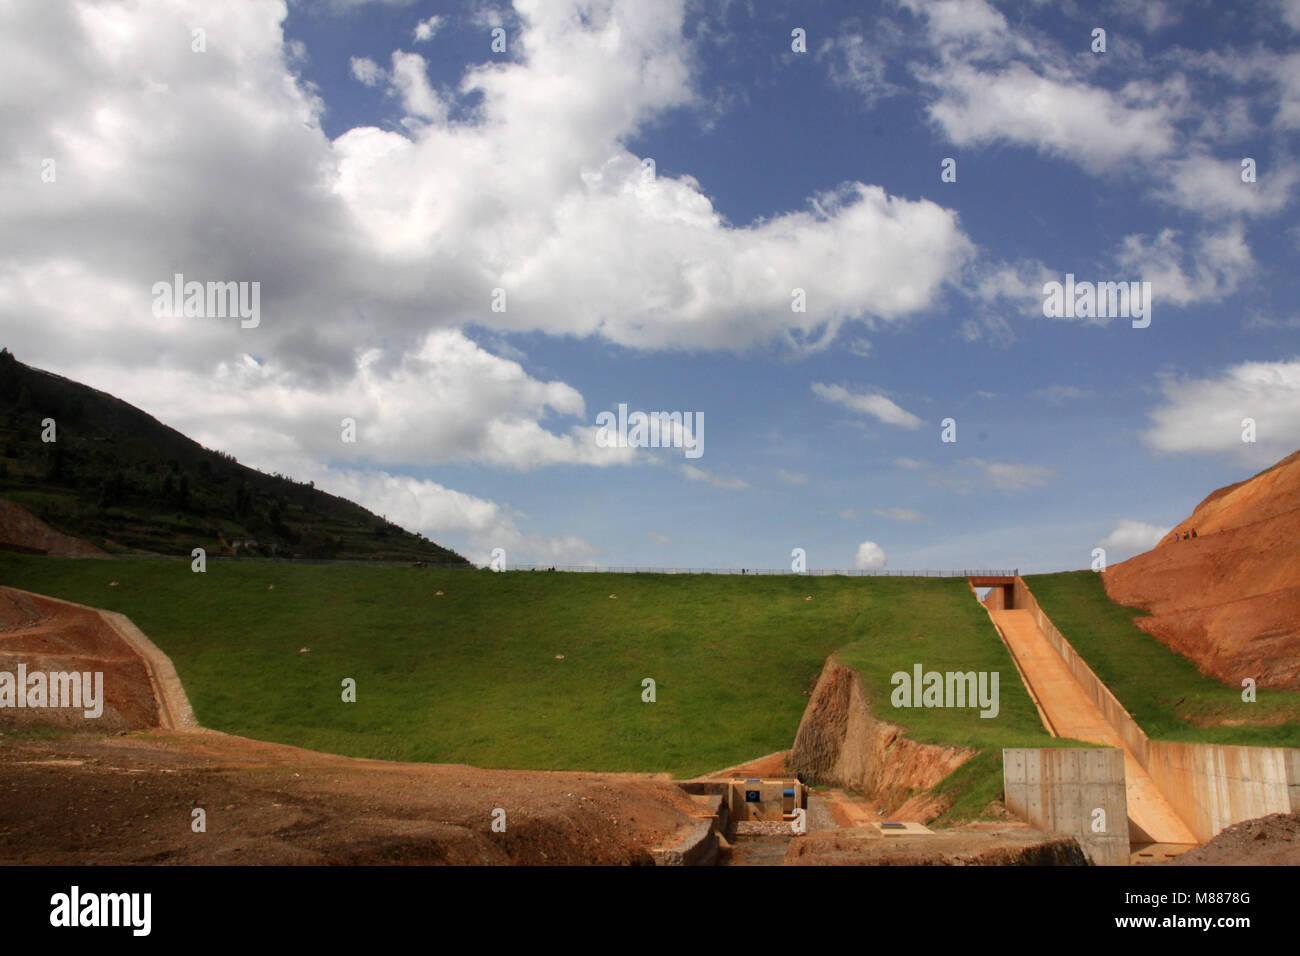 Rulindo, Rwanda. 15th Mar, 2018. Photo taken on Feb. 16, 2018 shows a view of Muyanza Dam built by China Geo-Engineering Stock Photo